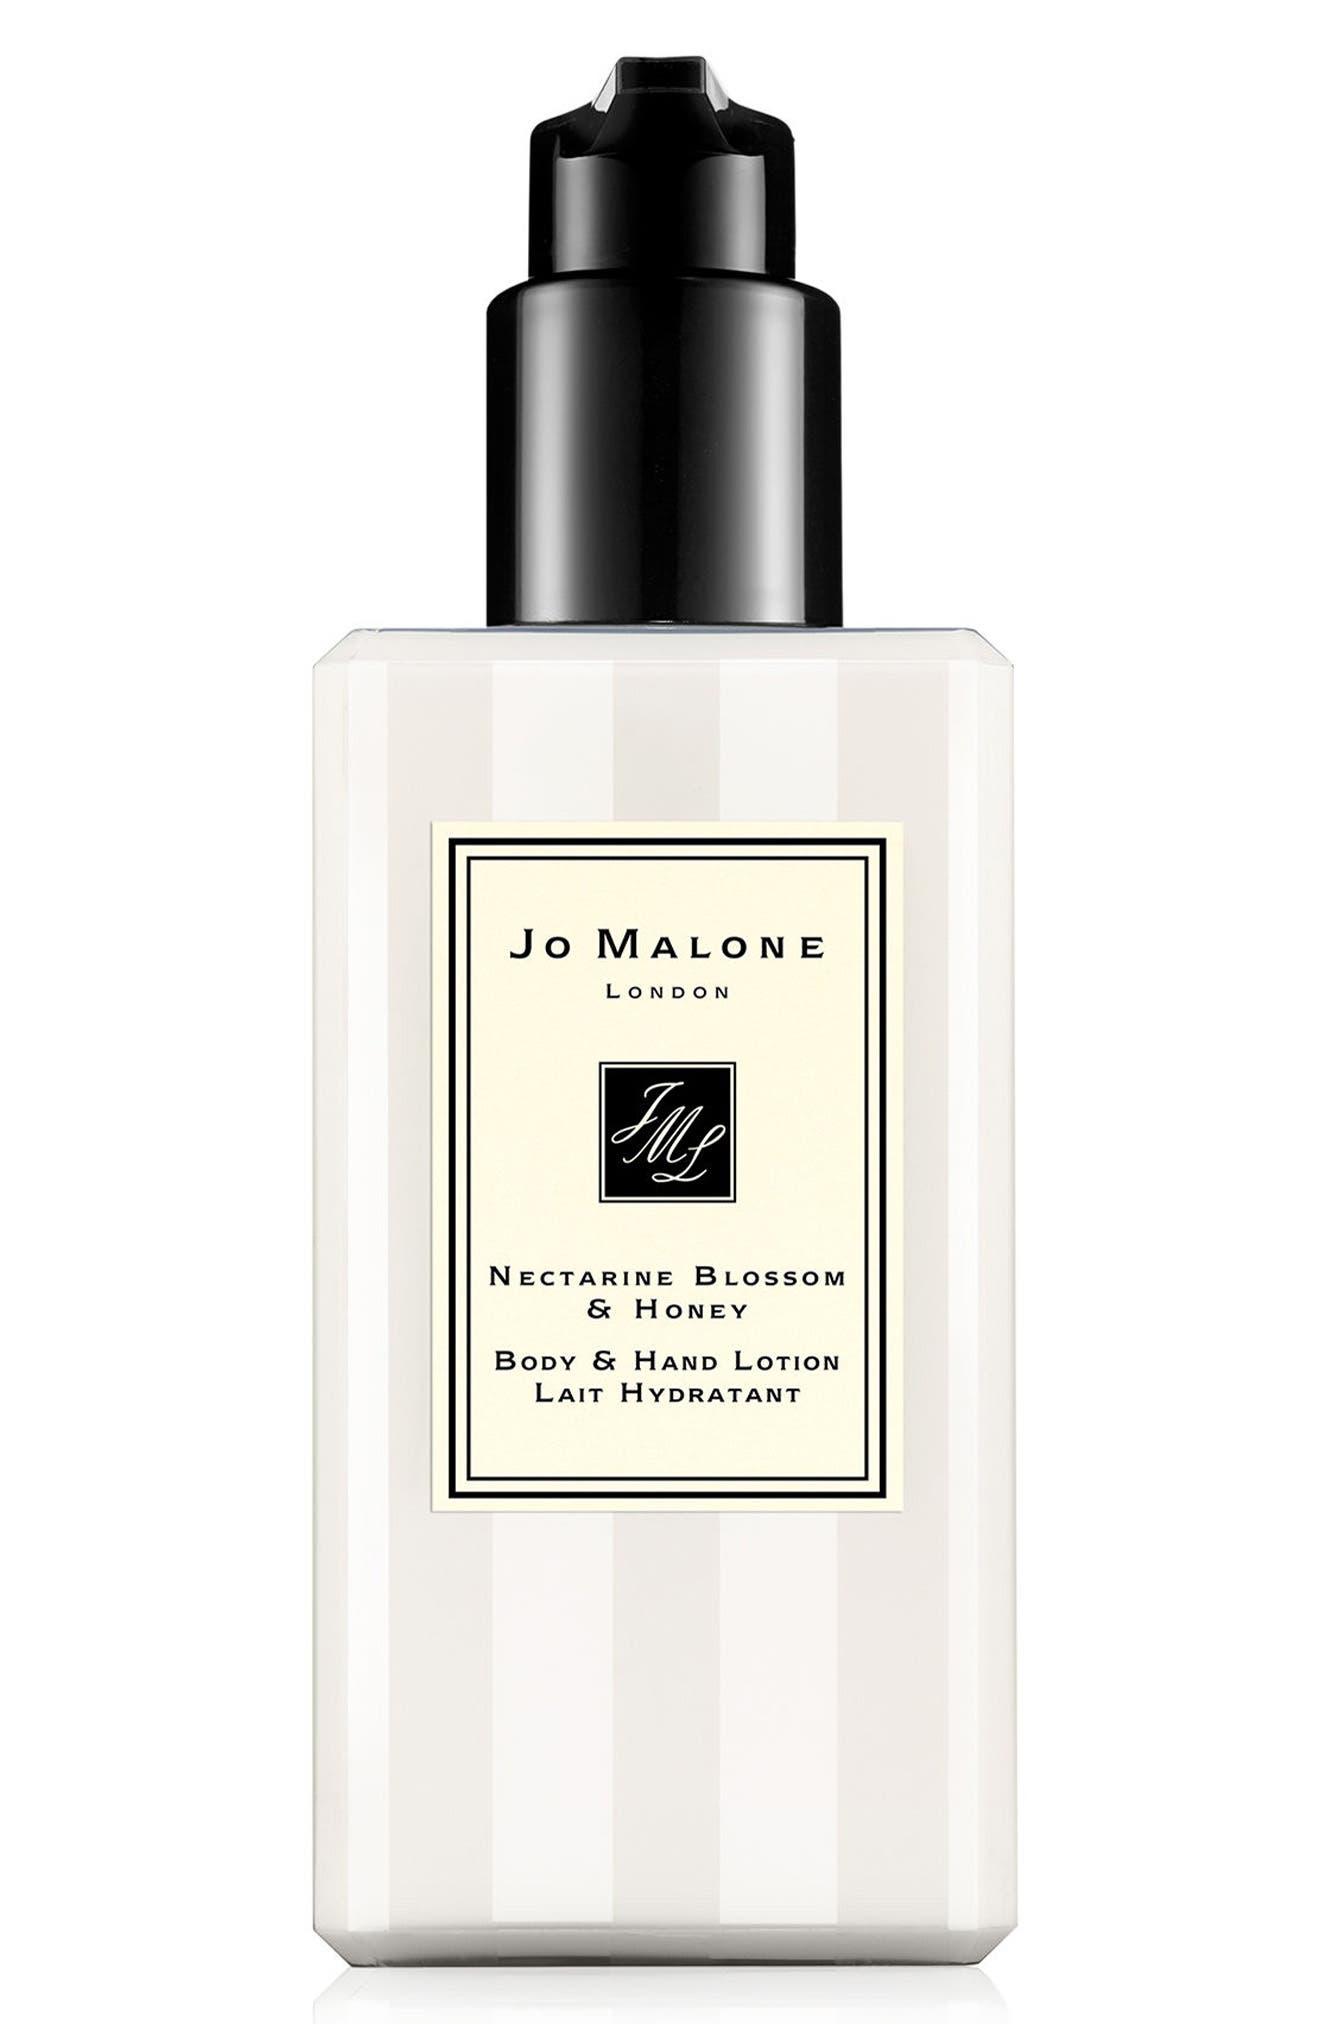 Jo Malone London(TM) Nectarine Blossom & Honey Body & Hand Lotion